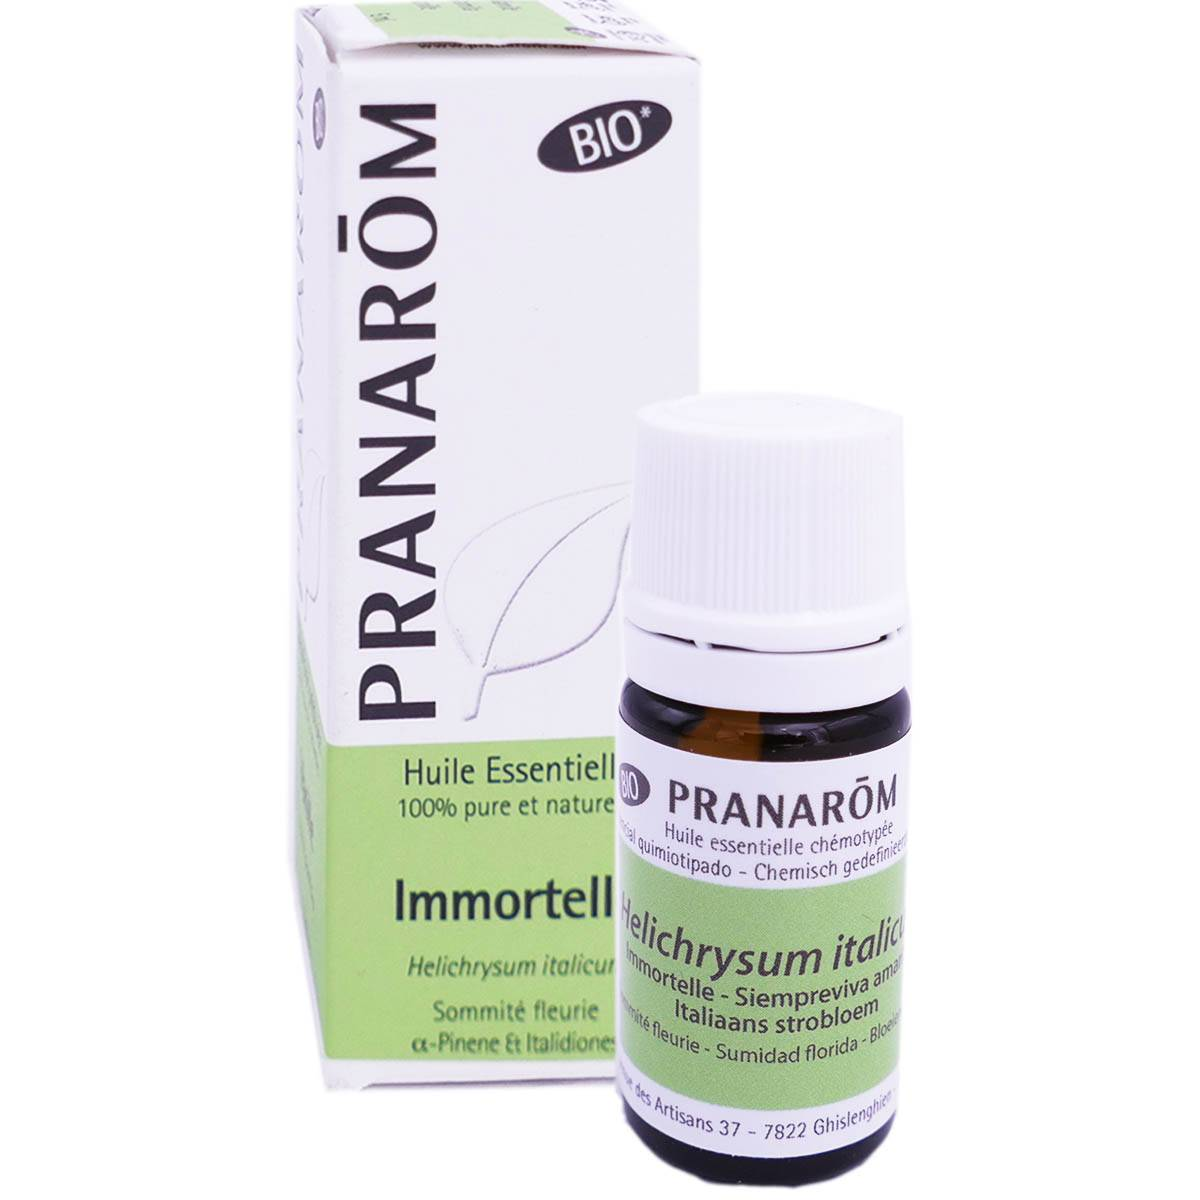 Pranarom huile essentielle immortelle bio 5ml